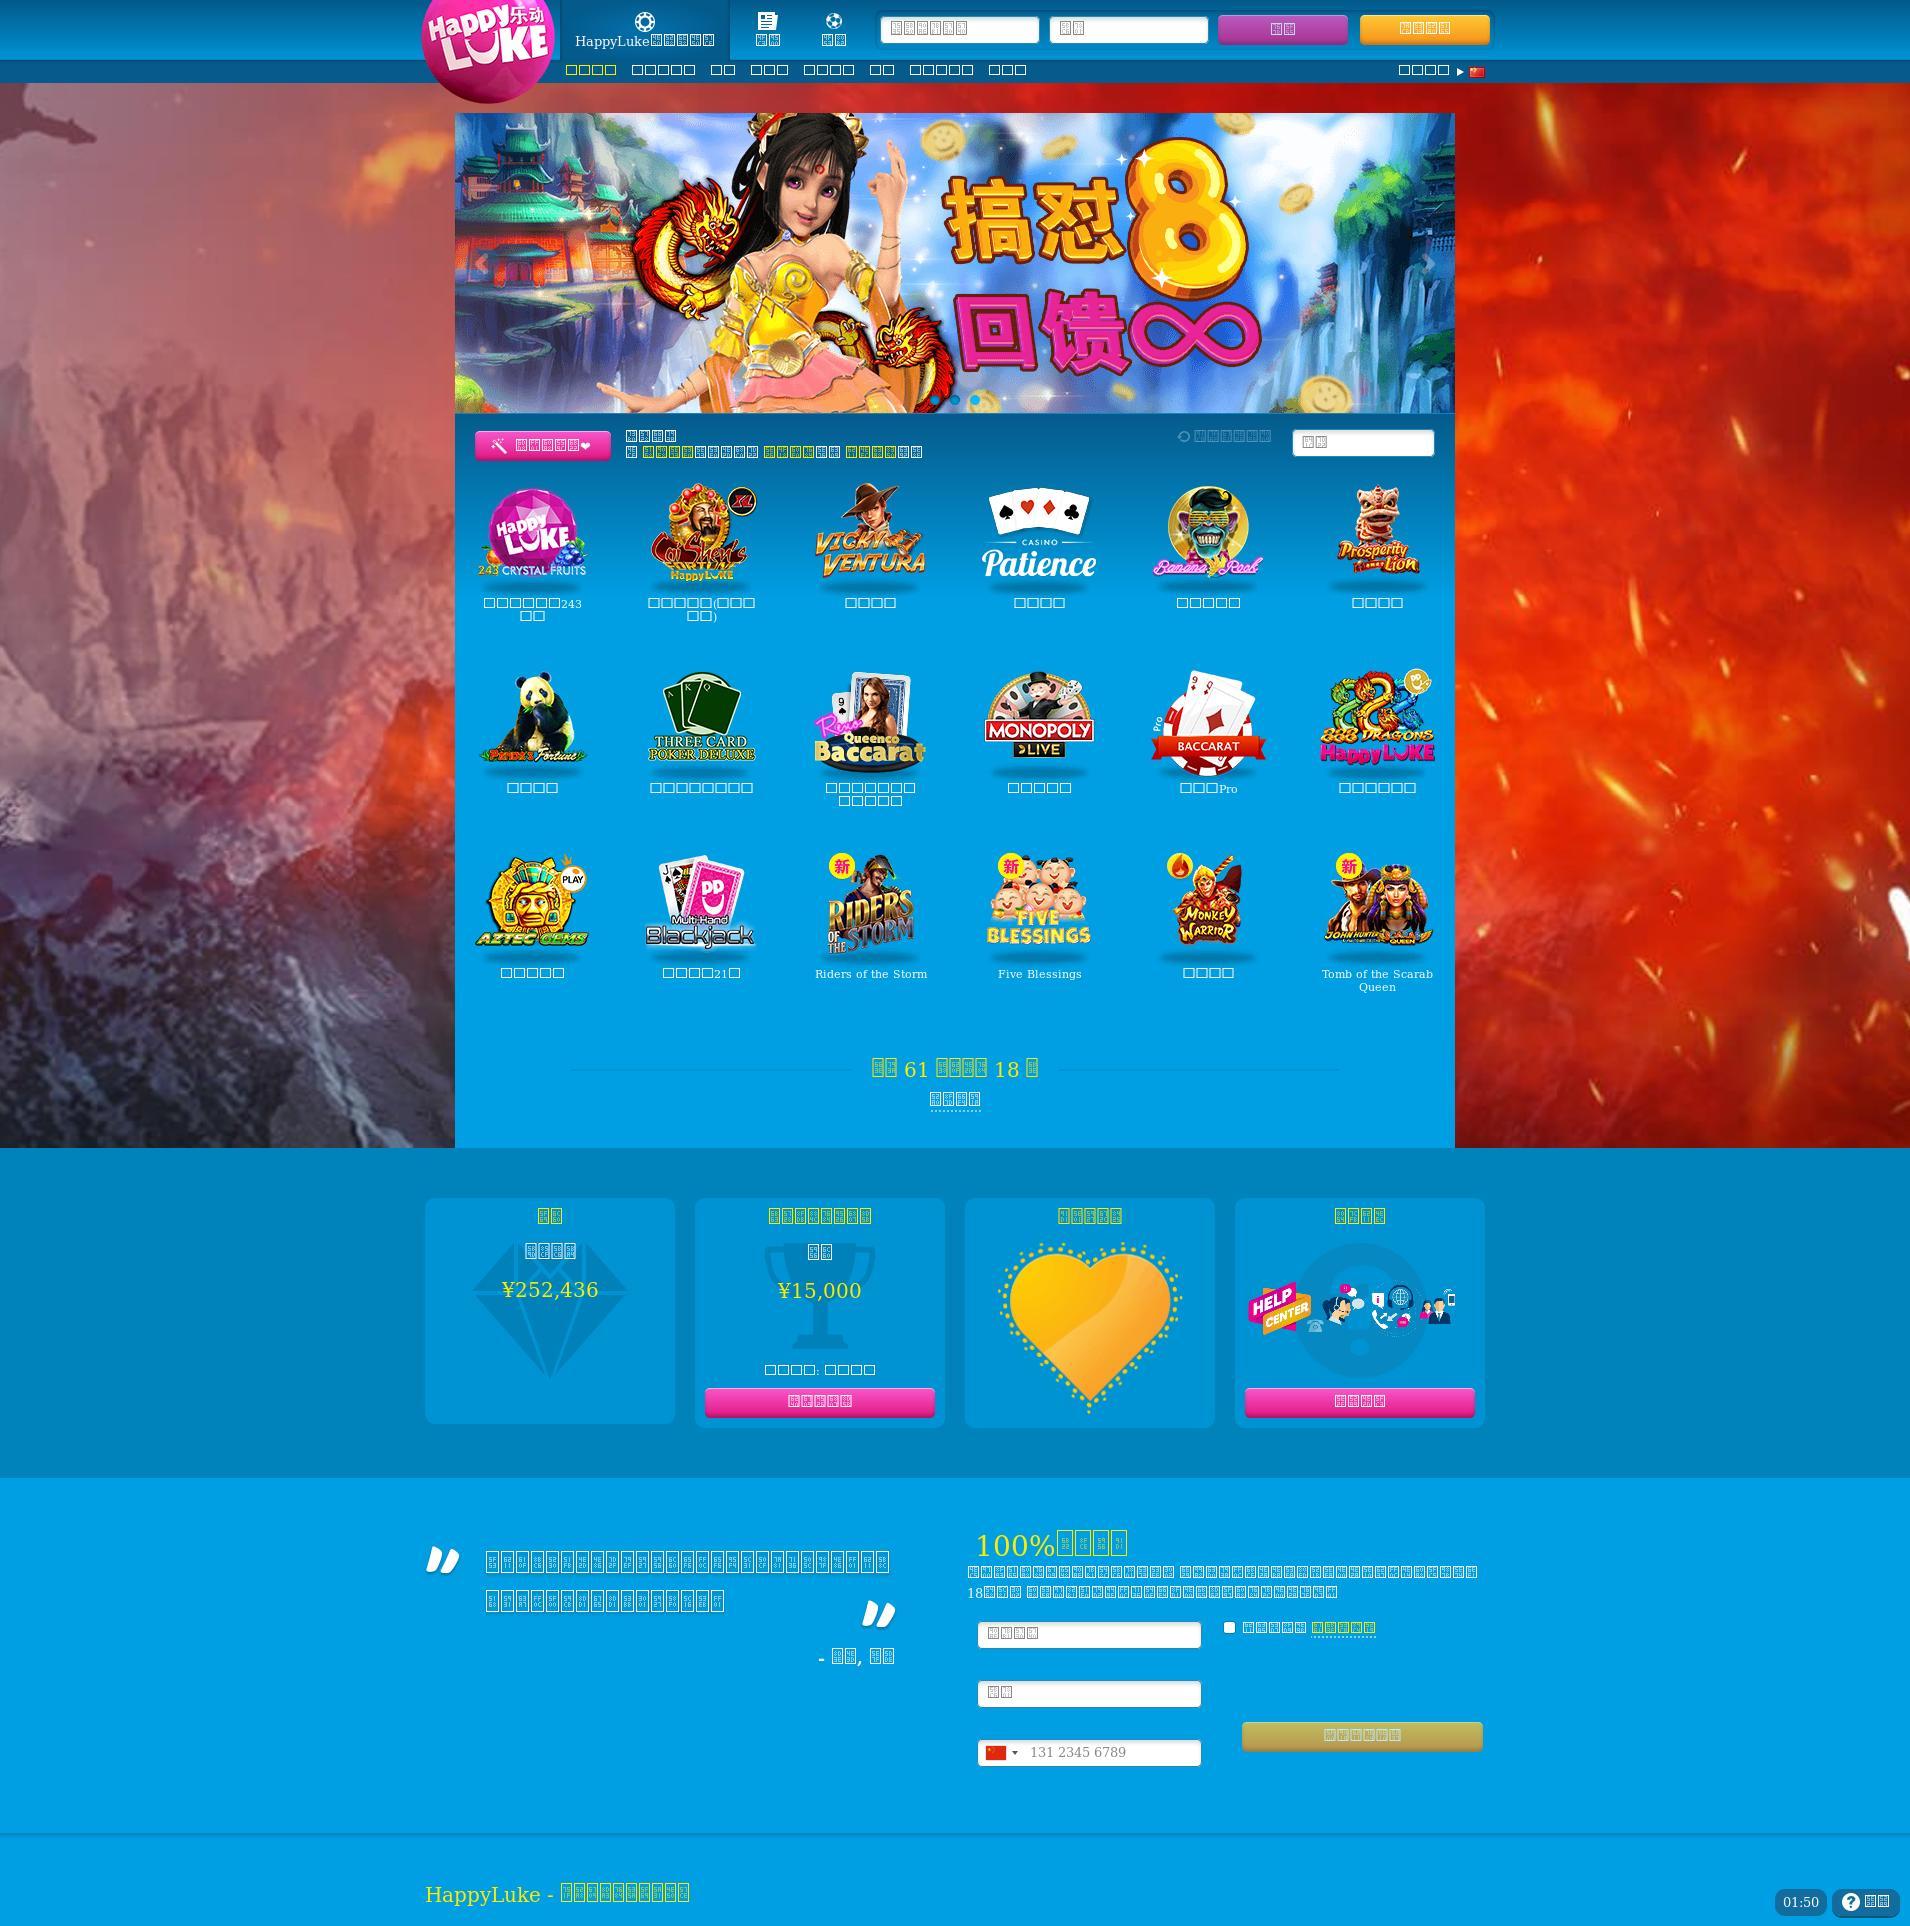 Casino screen Lobby 2019-09-20 for China